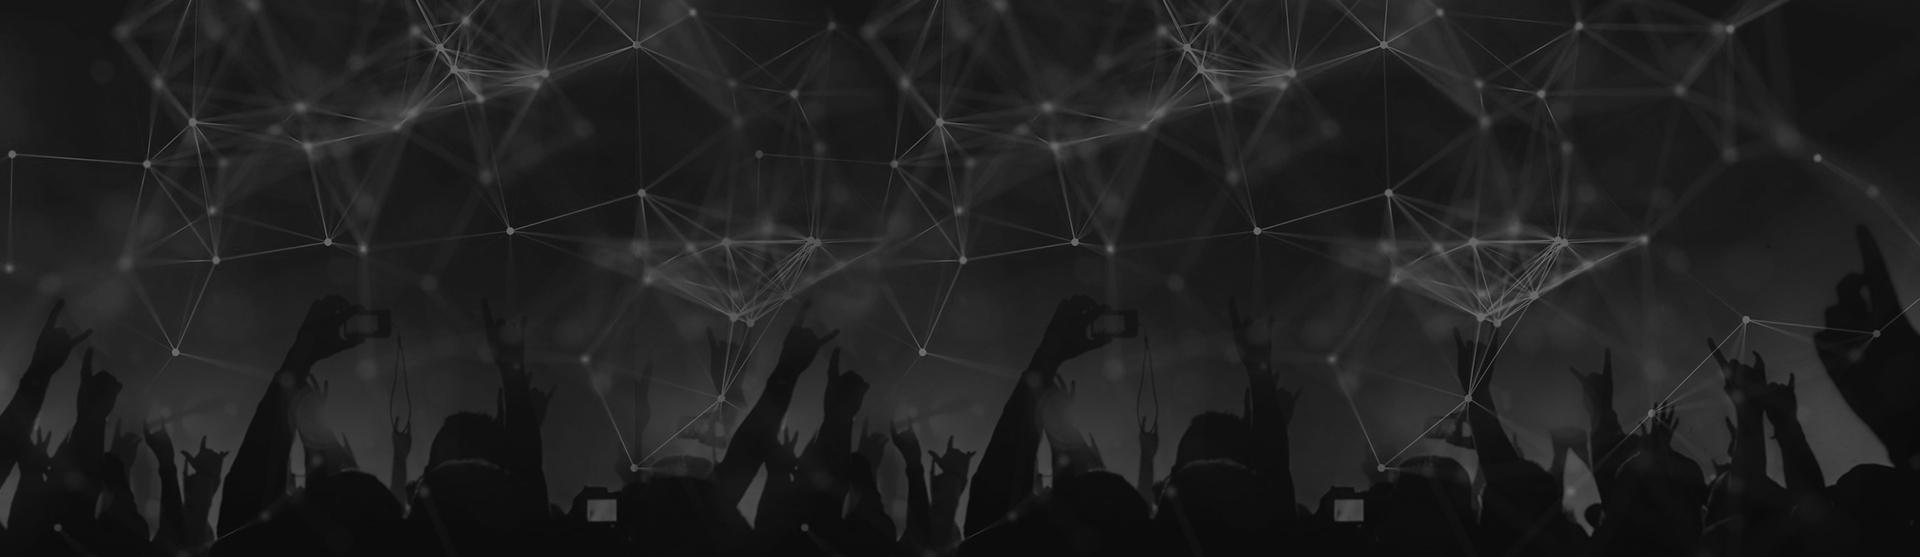 RAMA Group Blockchain in Entertainment